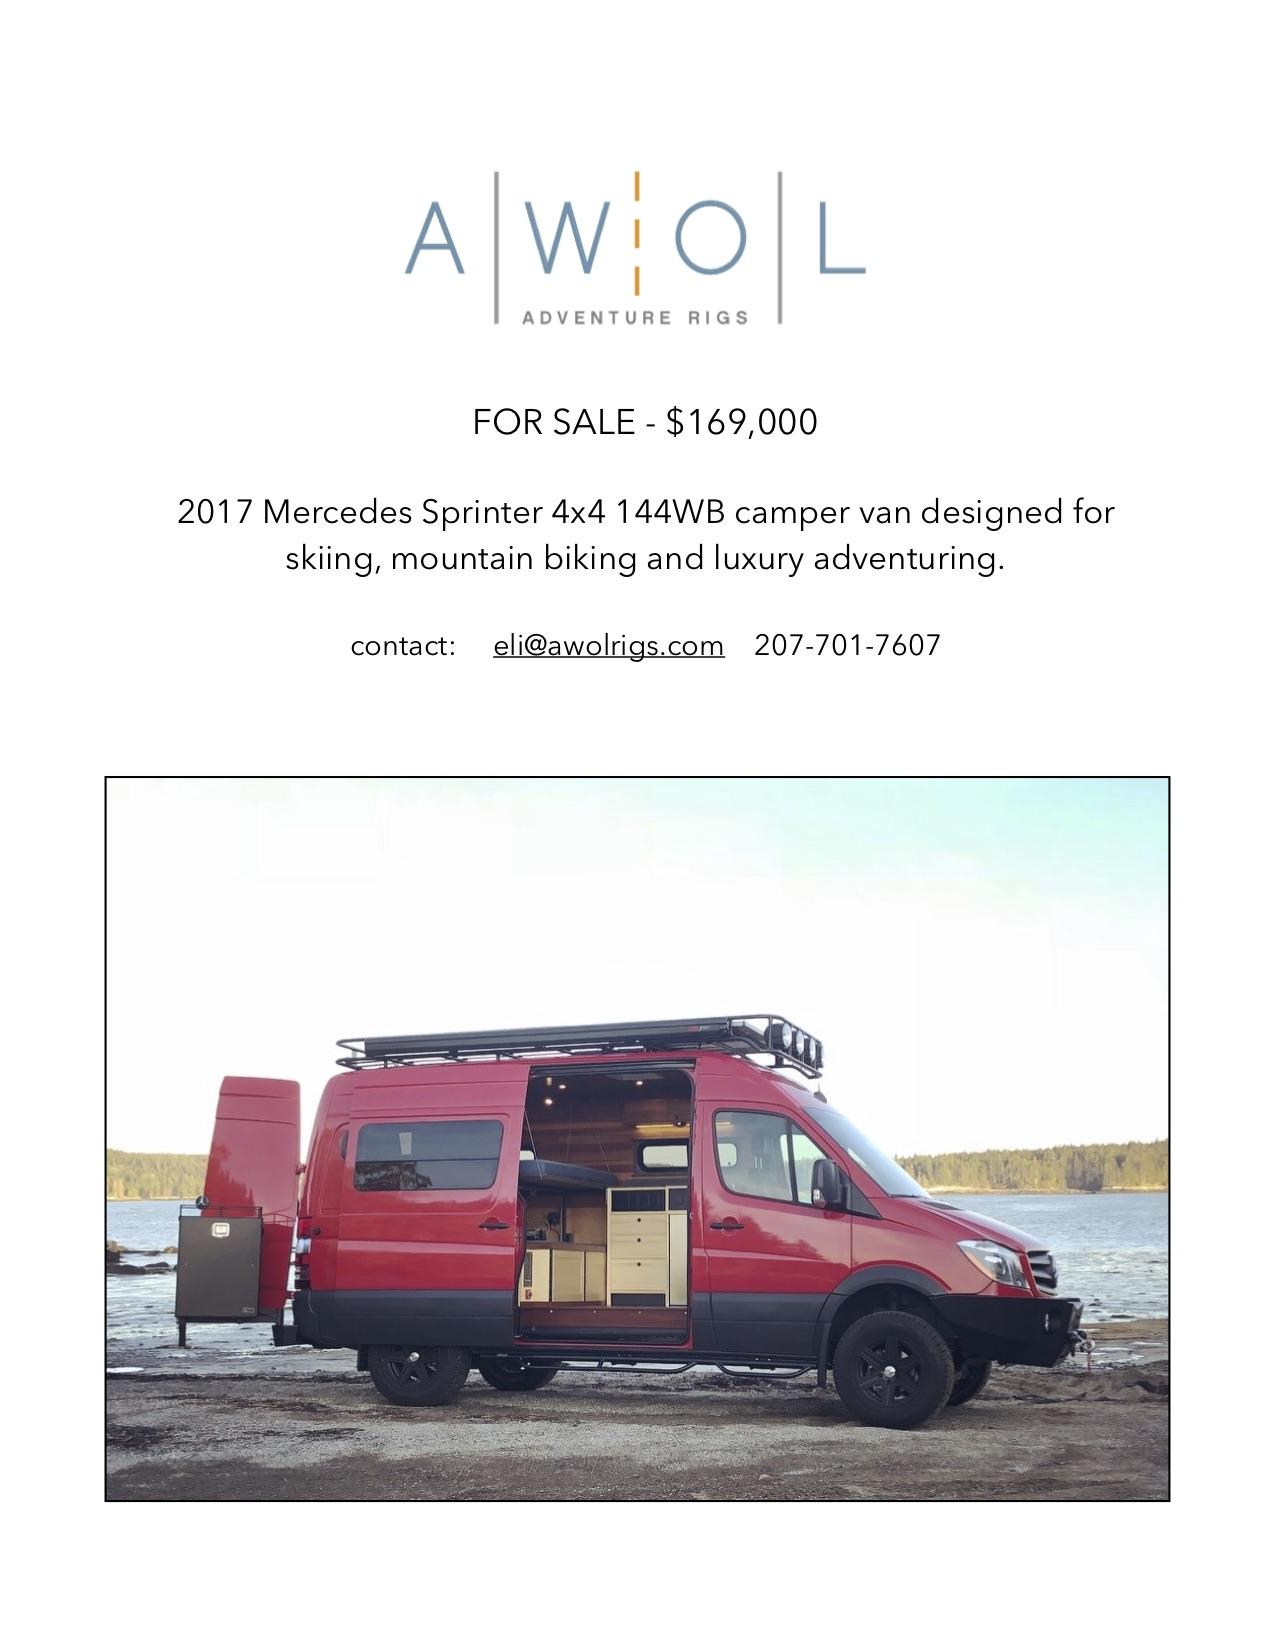 AWOL - Ski Bus Listing 1.jpg